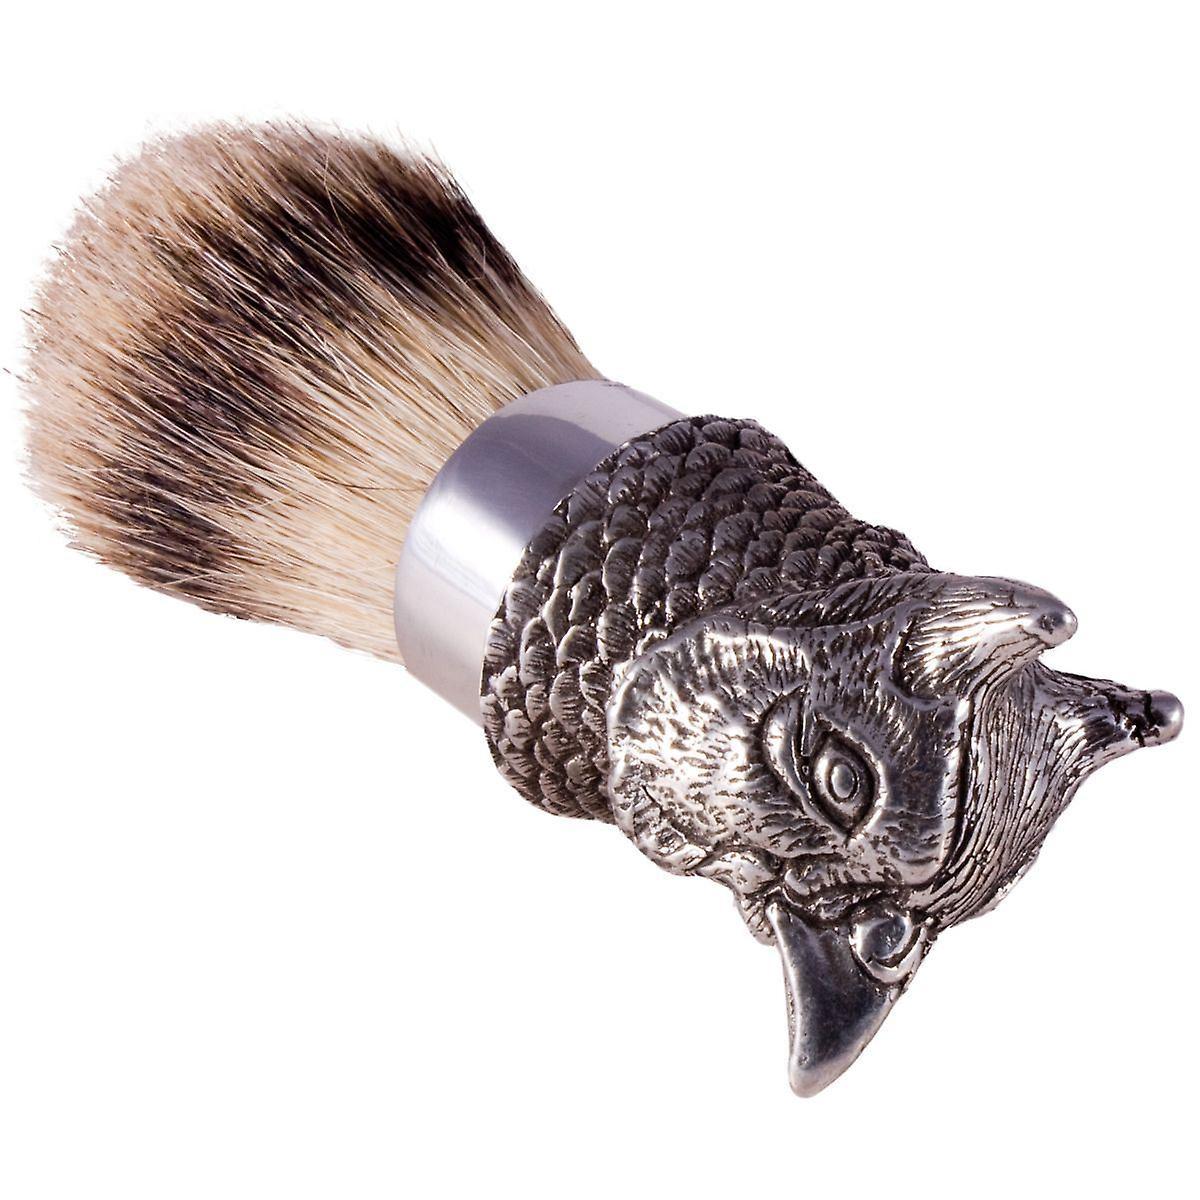 The English Pewter Co Silvertip Badger Hair Shaving Brush-Pheasant